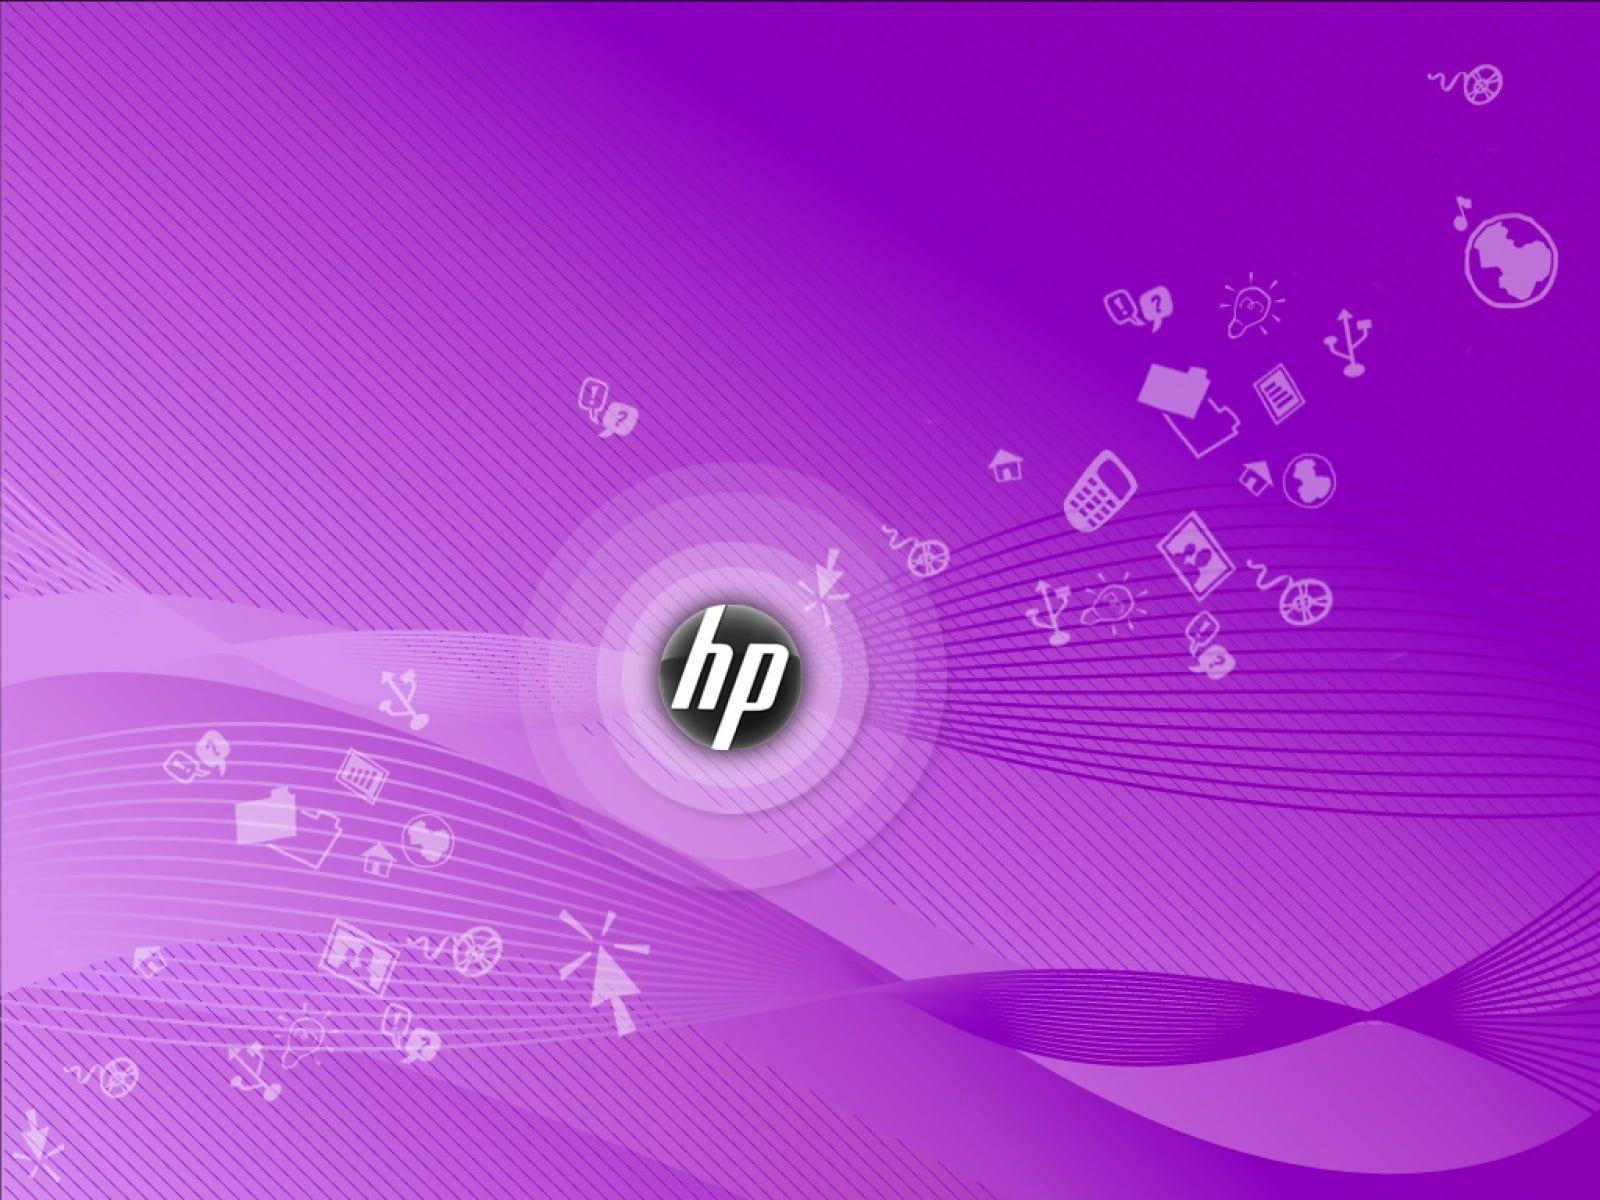 Style For Hp Hp Logo Computers Hp Purple Graphics 720p Wallpaper Hdwallpaper Desktop In 2021 Desktop Wallpapers Backgrounds Laptop Wallpaper Hd Wallpaper